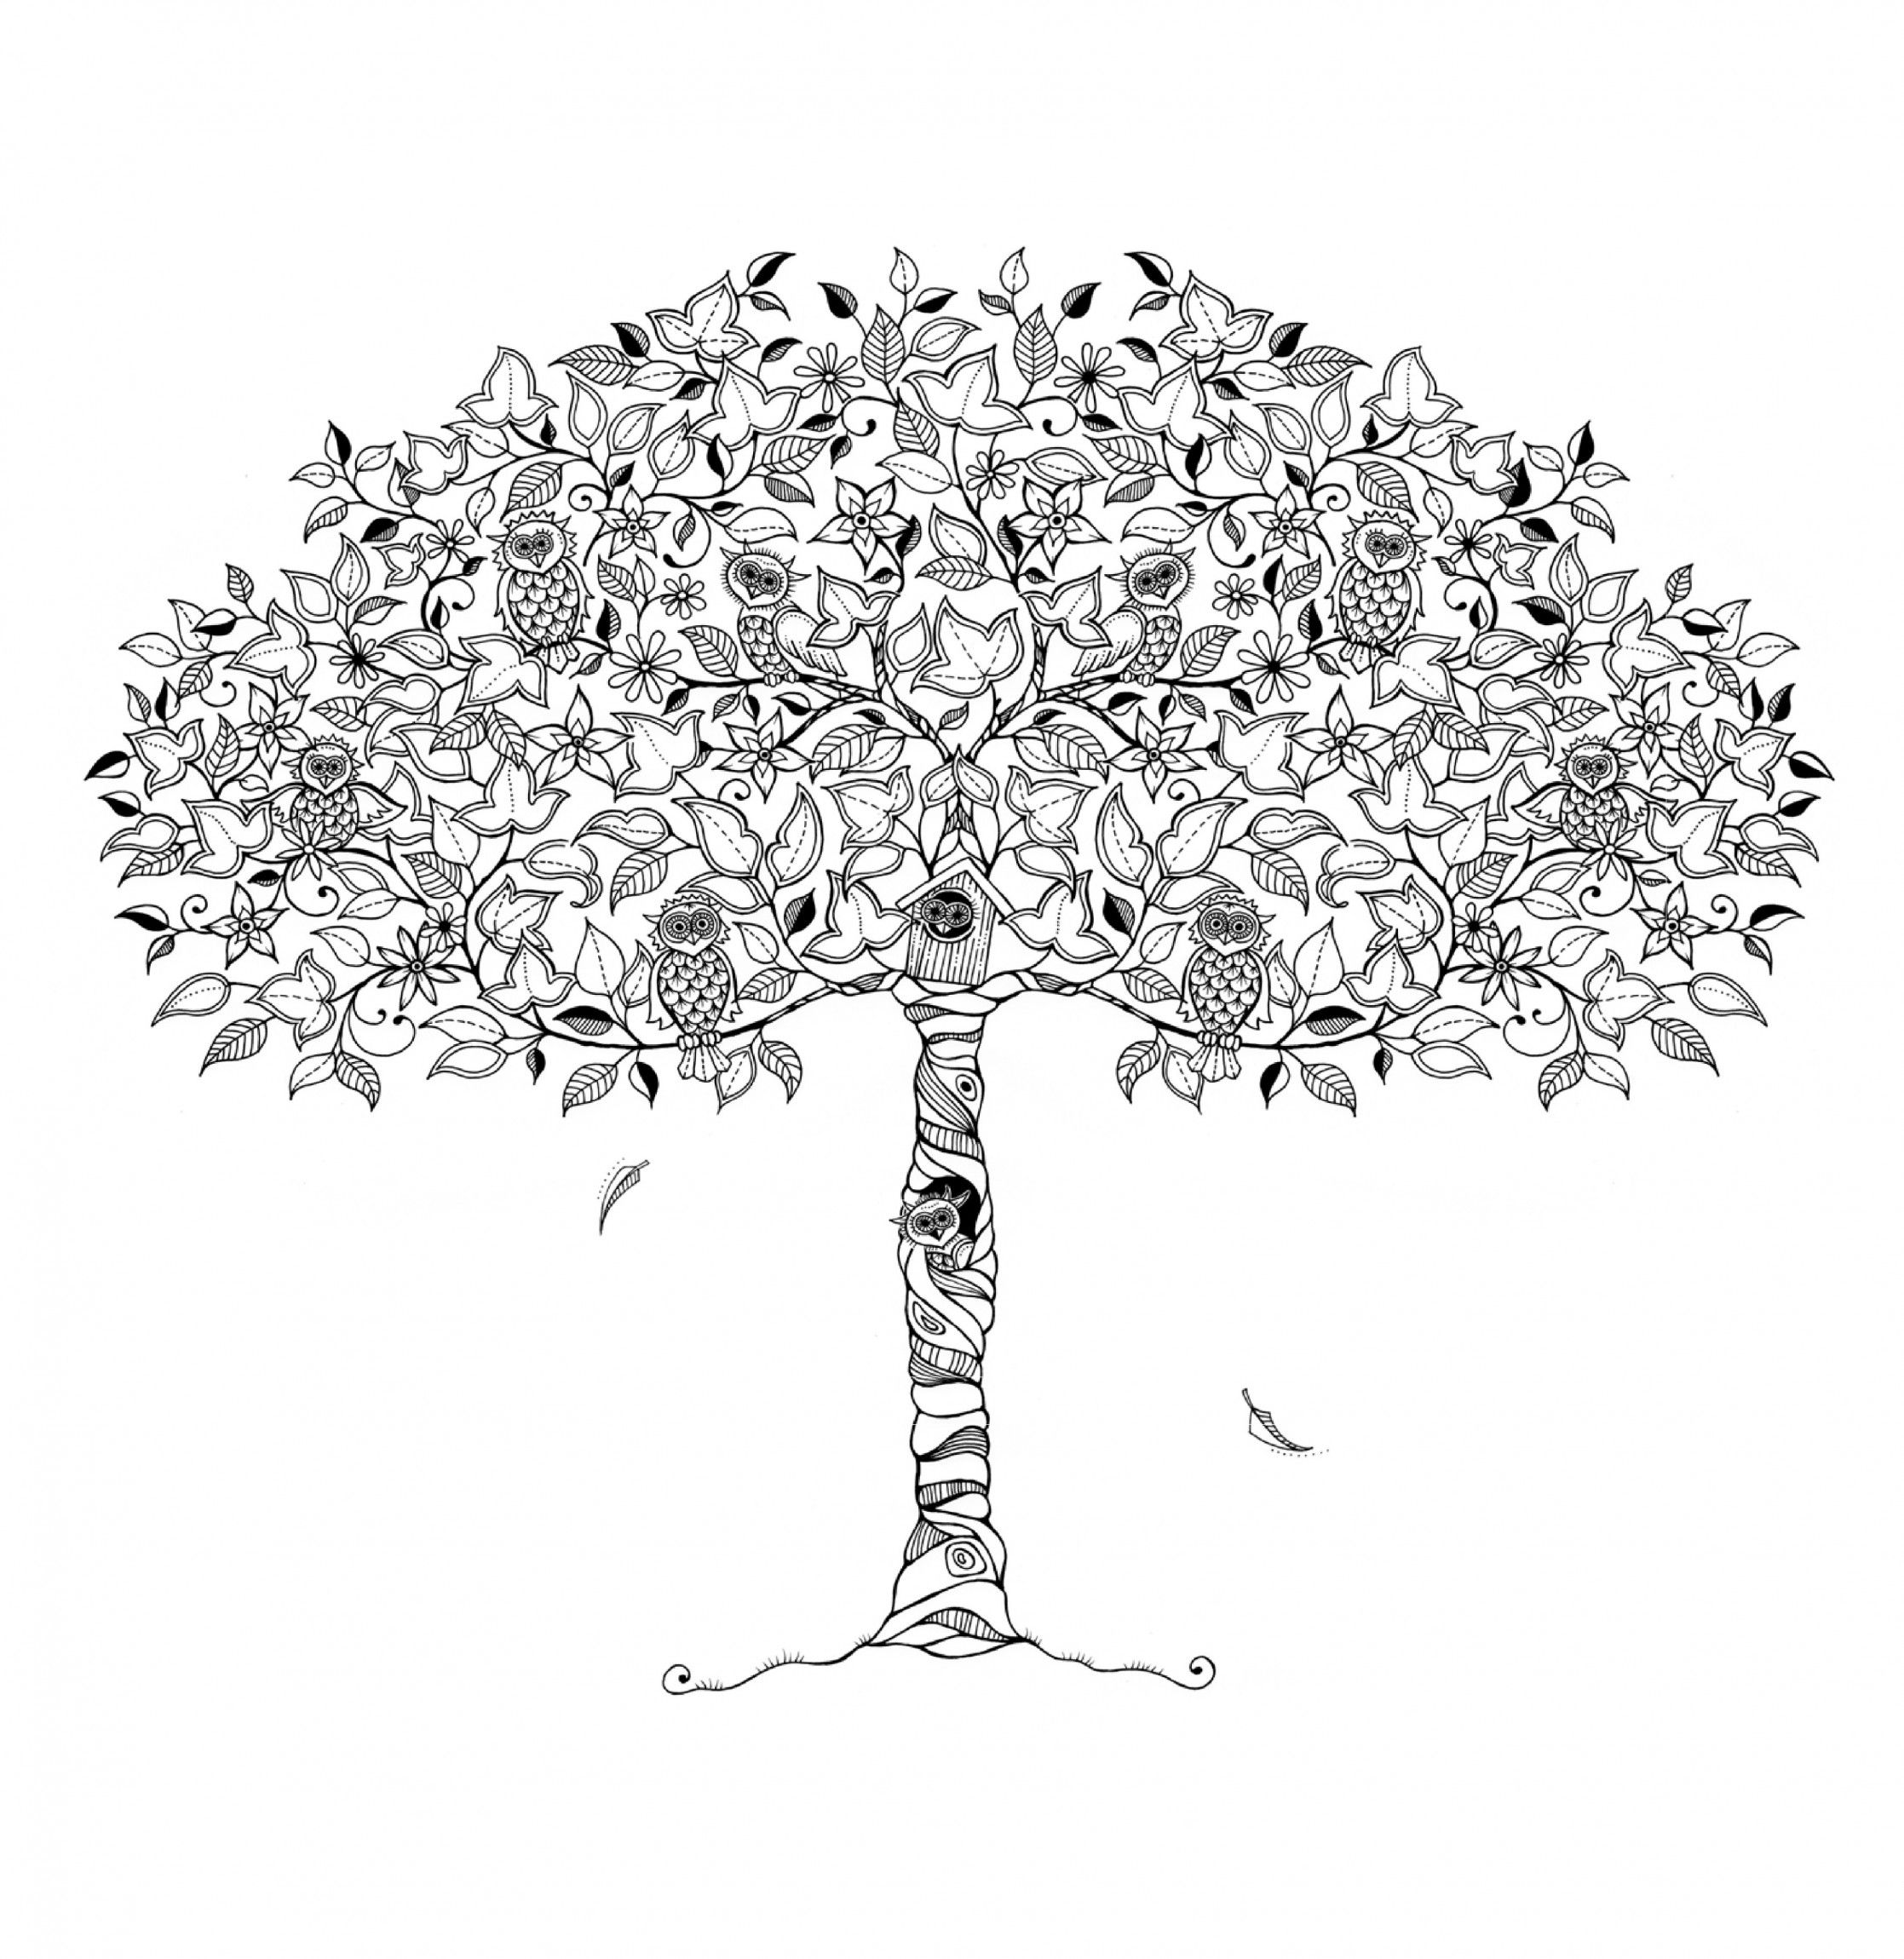 We've got a free download from Secret Garden Artist's Edition: A Pull-